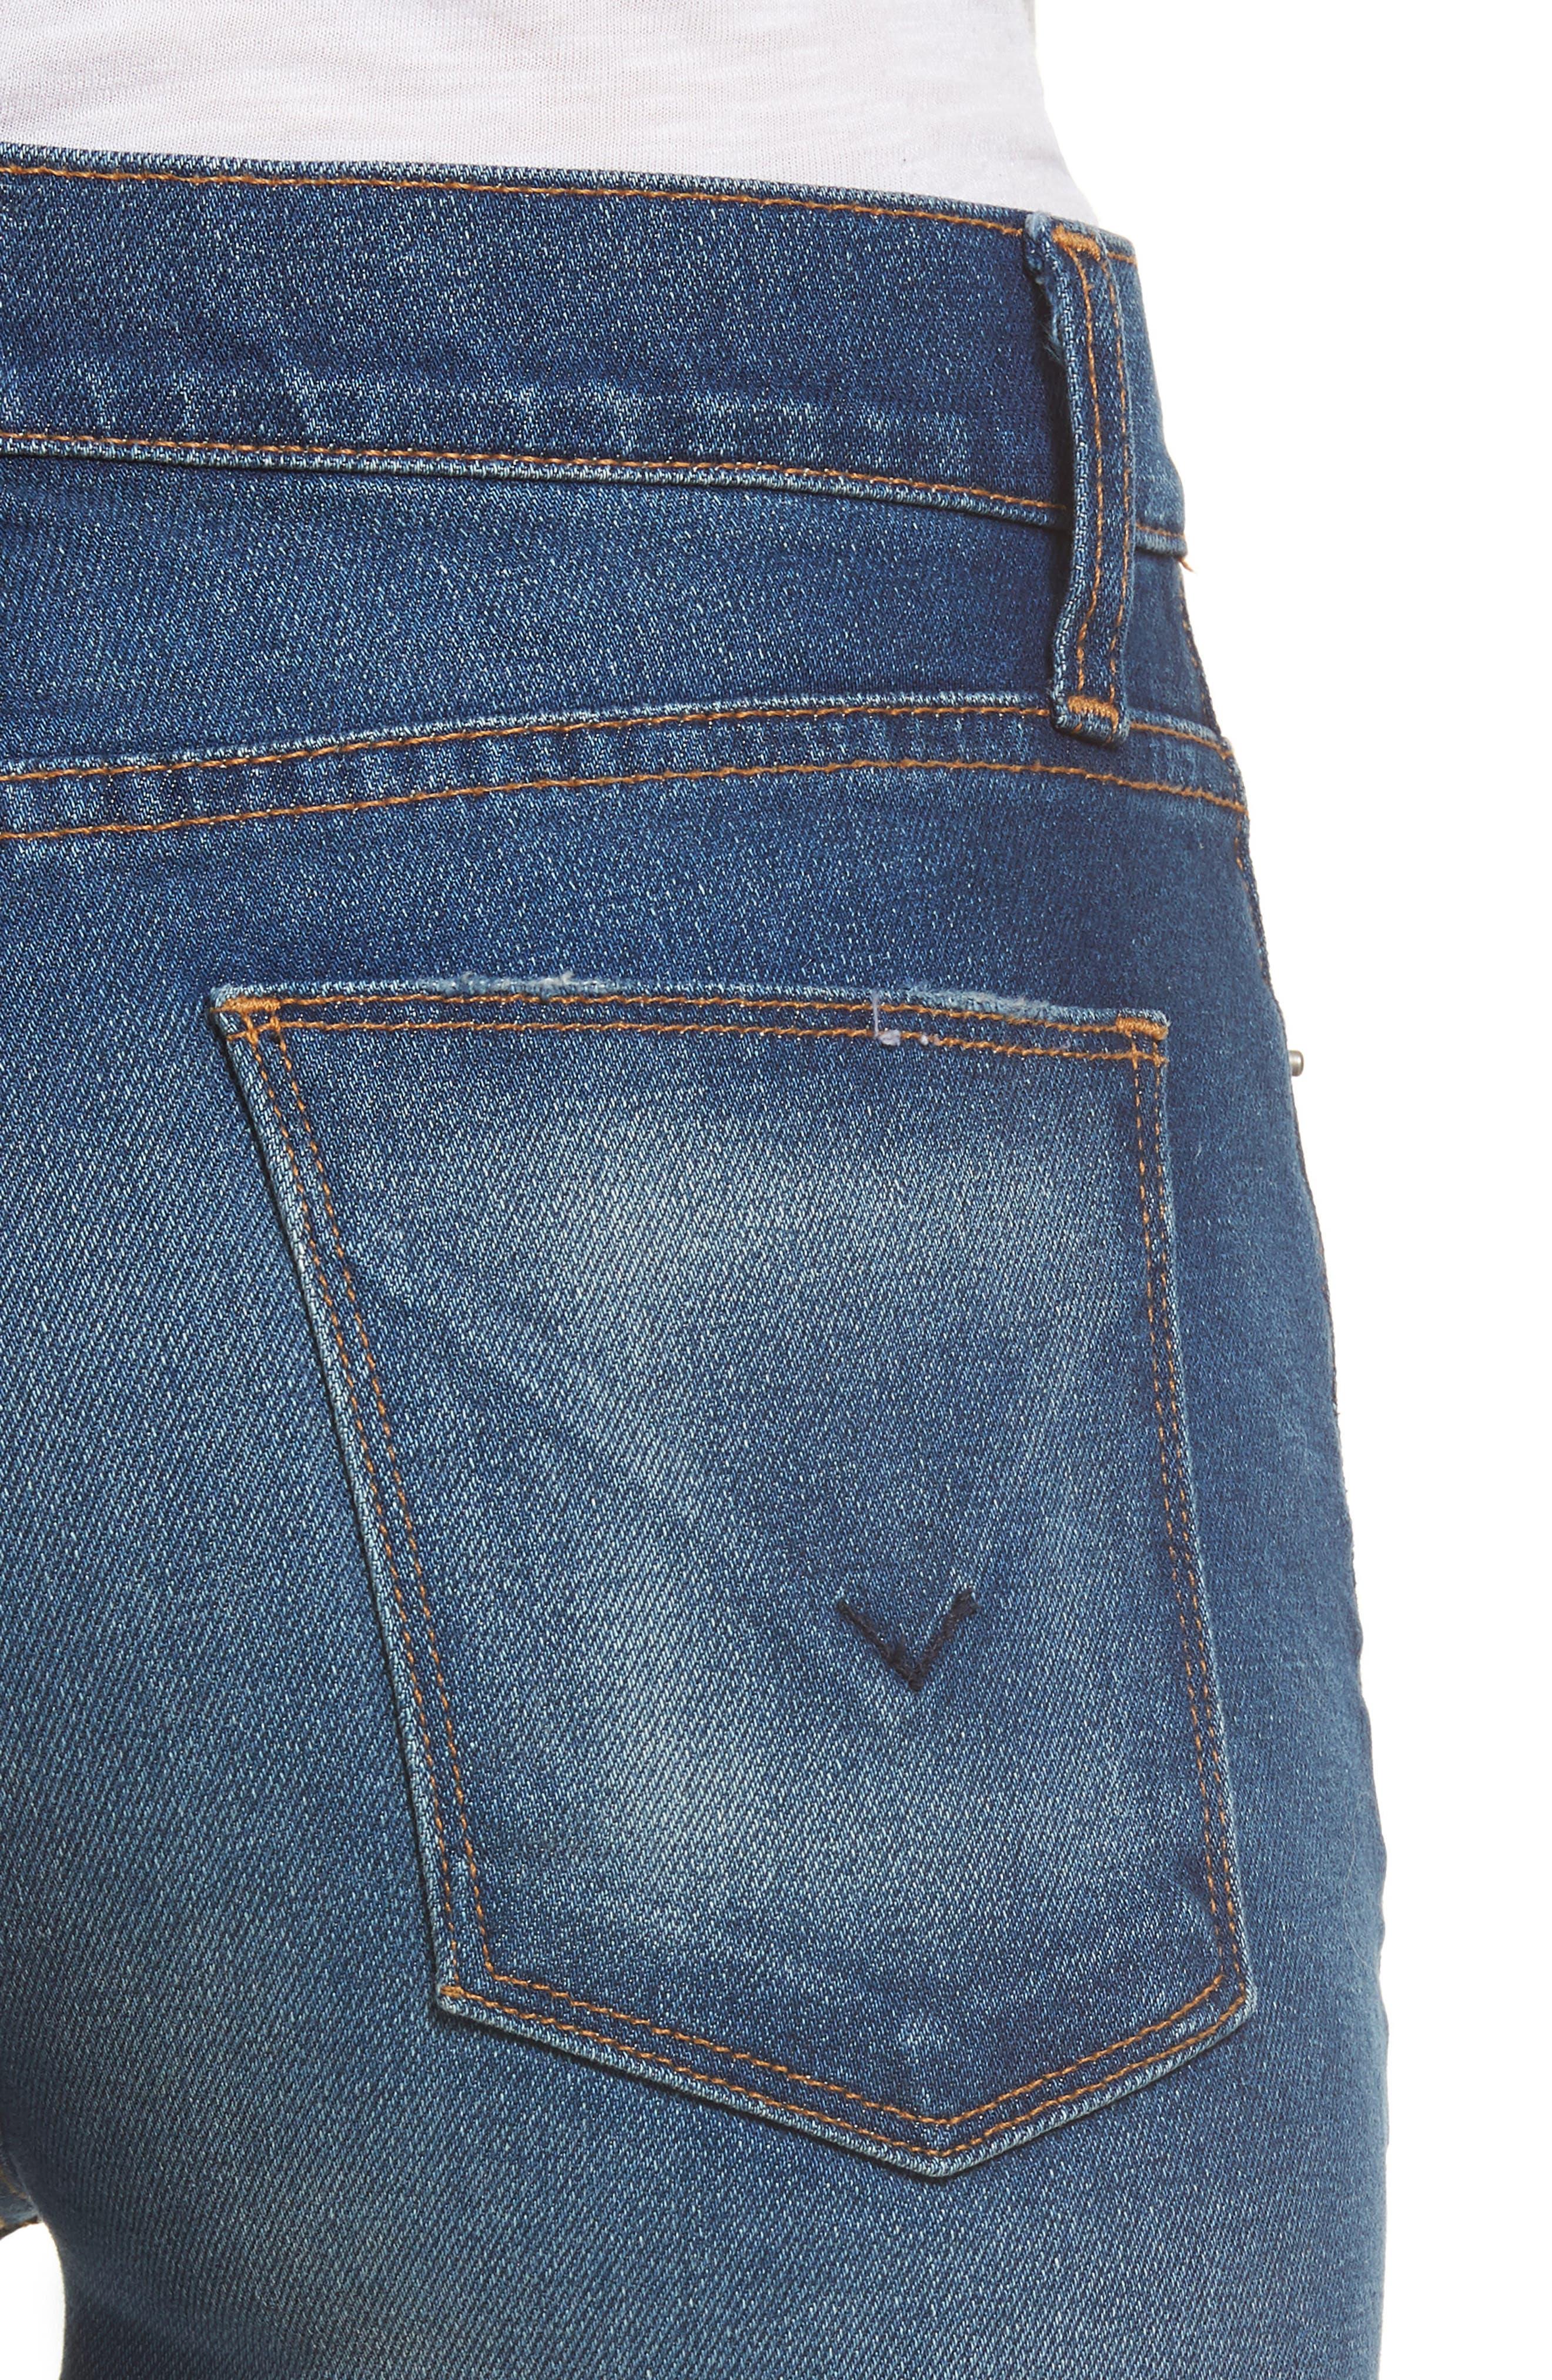 Zoeey High Waist Crop Straight Leg Jeans,                             Alternate thumbnail 4, color,                             420